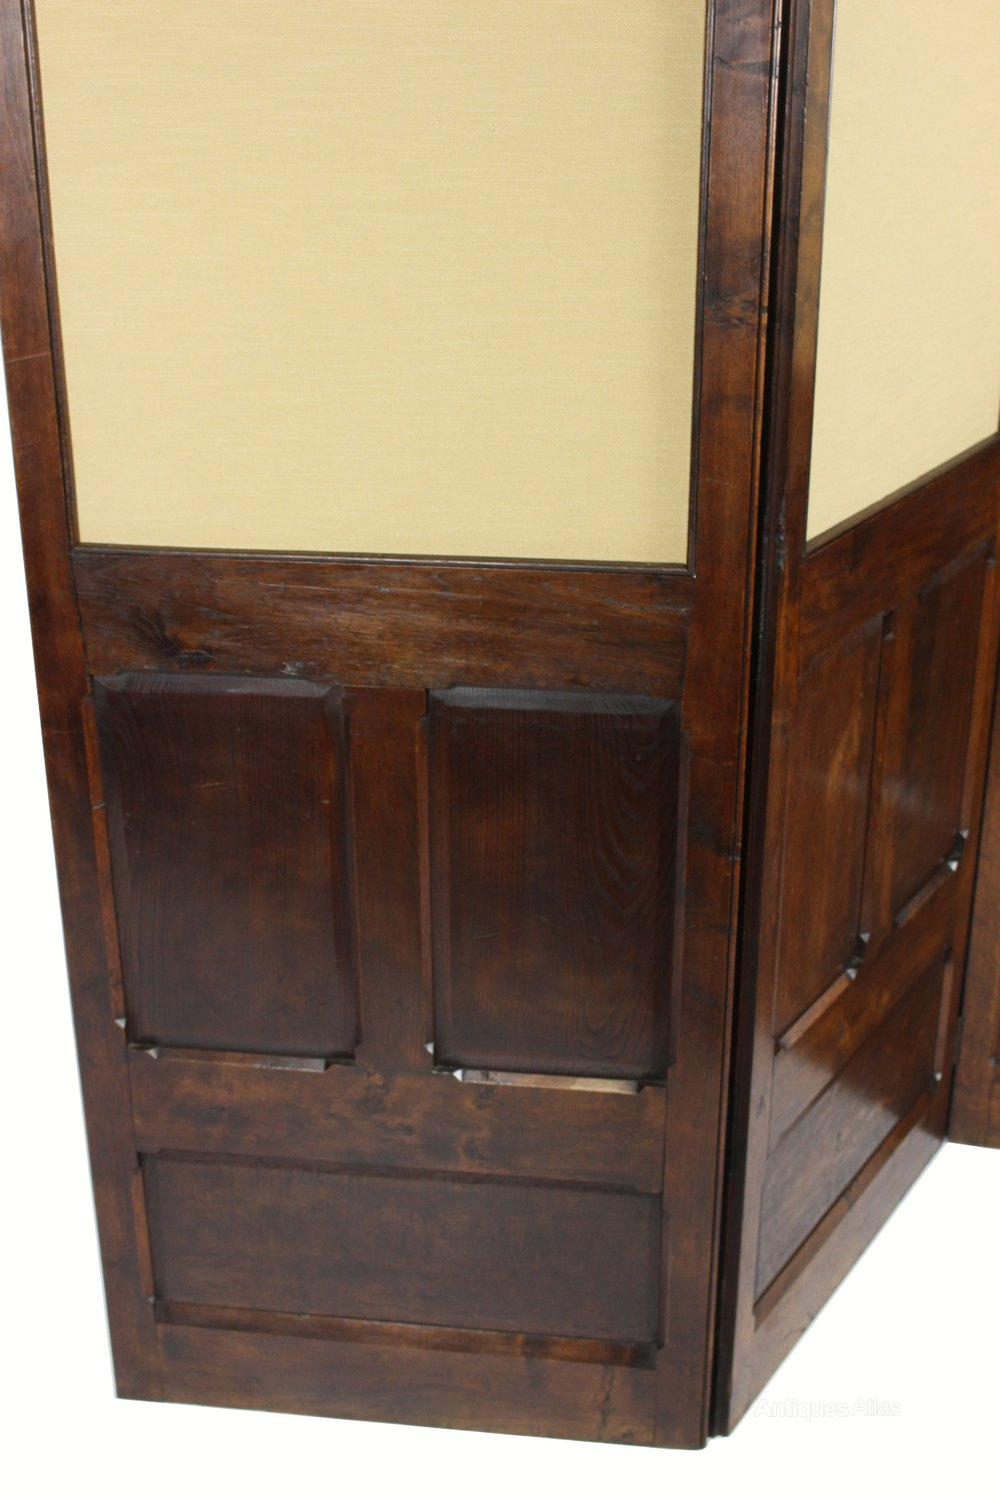 Antique Oak 3 Fold Dressing Screen Room Divider Antiques